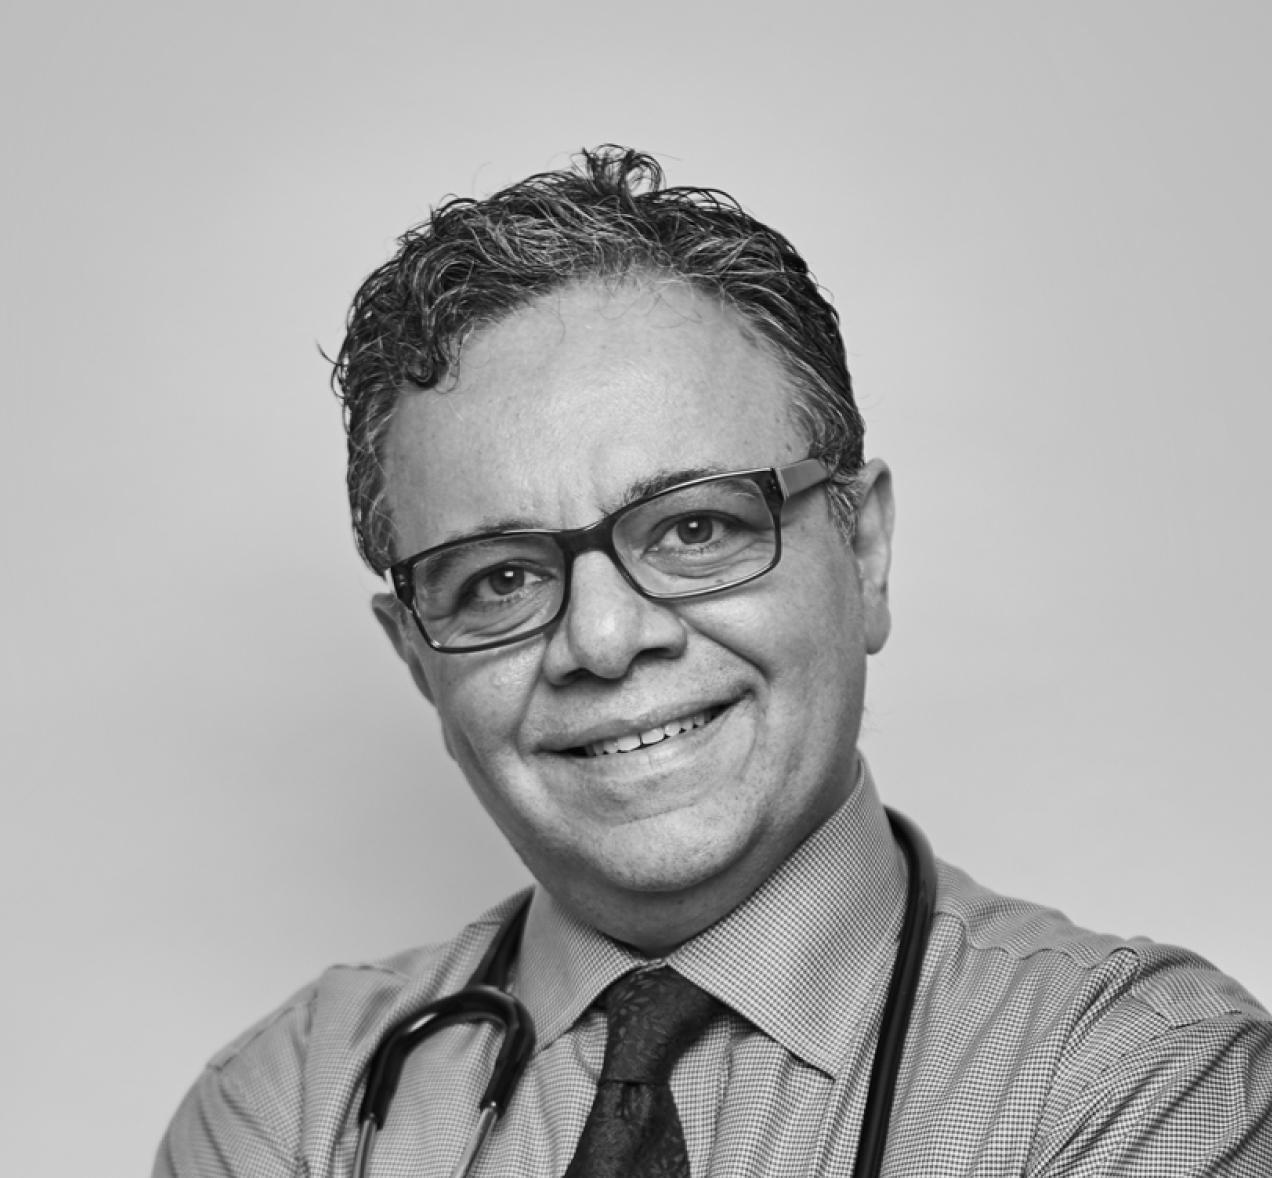 Clinical Trials for Doctors - TrialSpark